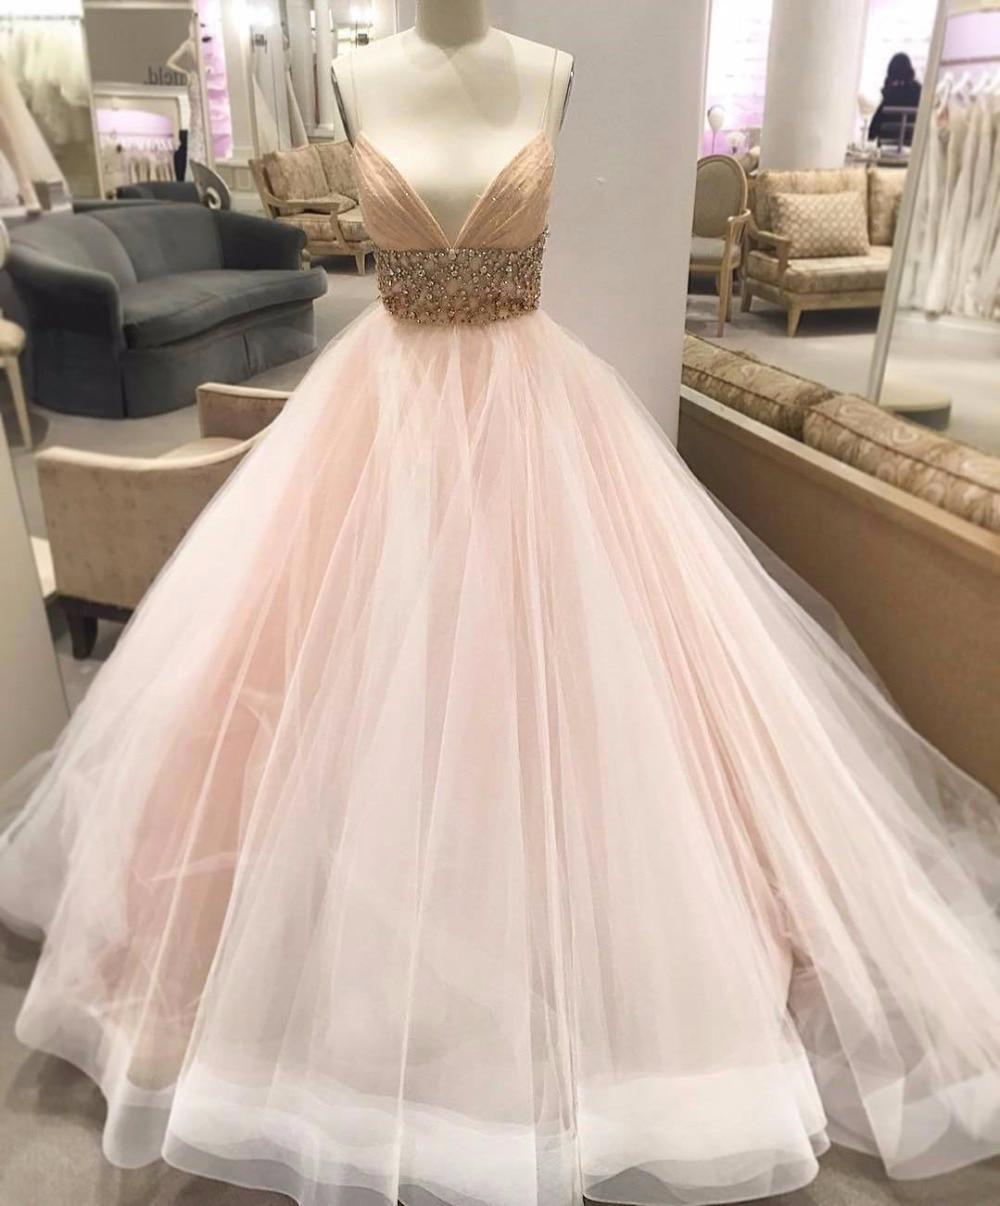 blush bridesmaid dresses plus size blush colored wedding dress Blush Pink Wedding Dresses Rustic Country